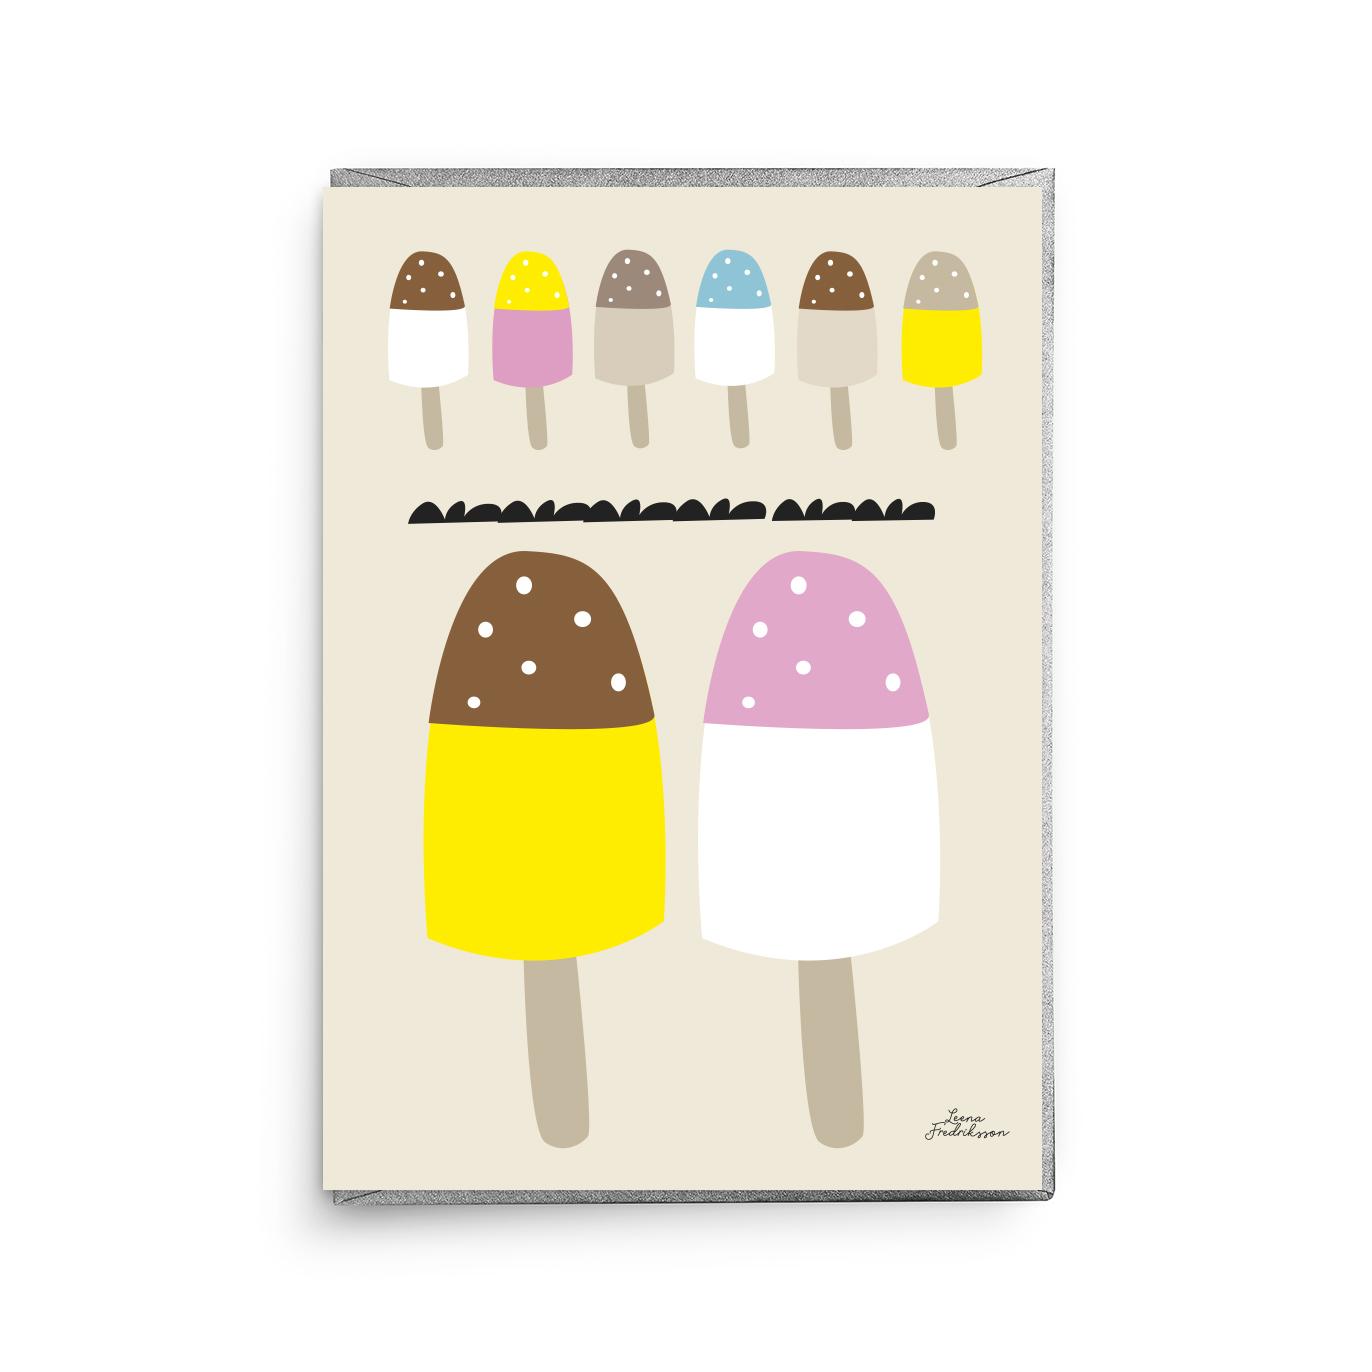 KOTI jäätelöt,  greeting card